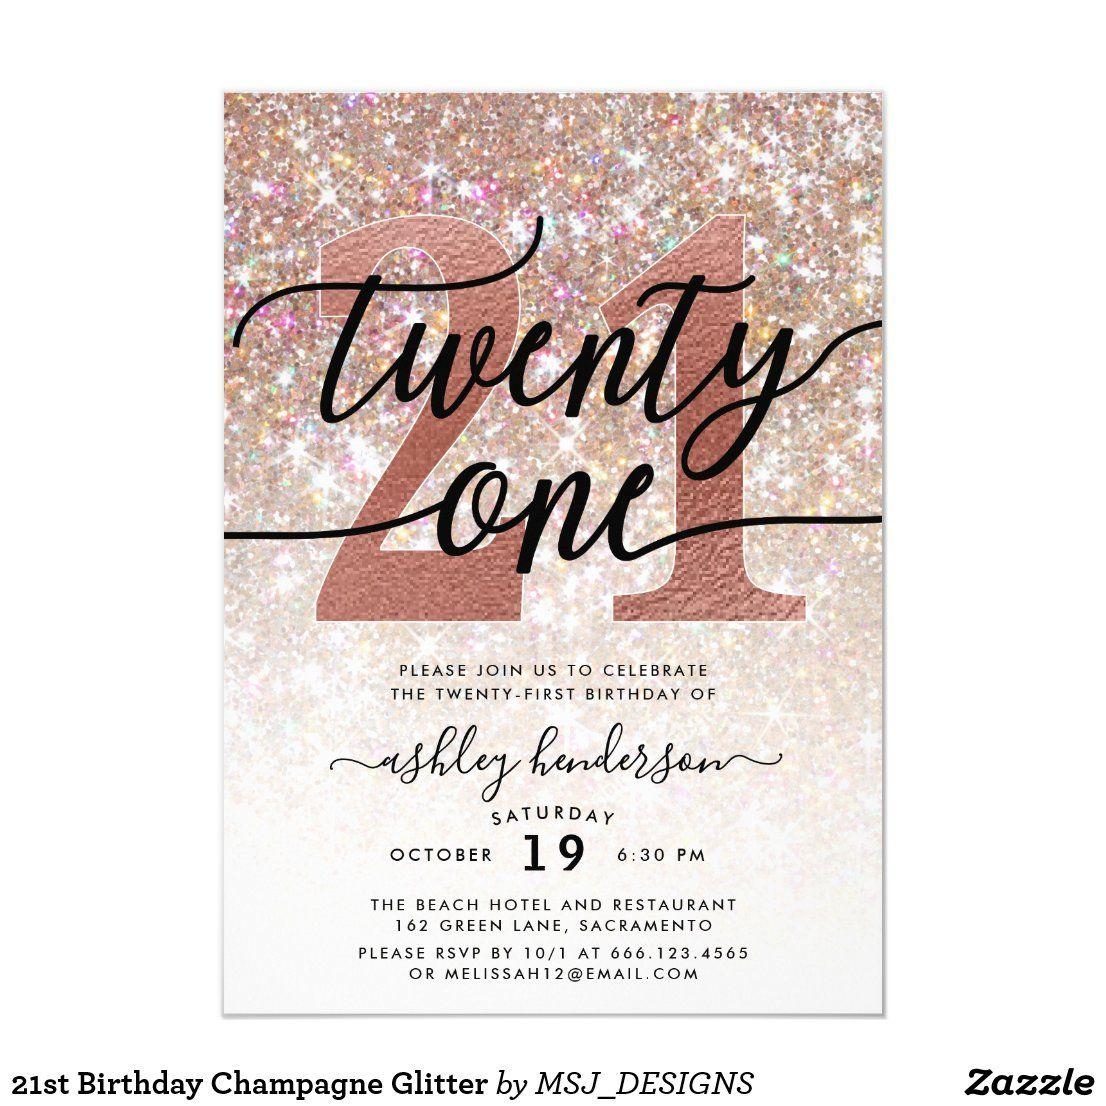 21st Birthday Champagne Glitter Invitation in